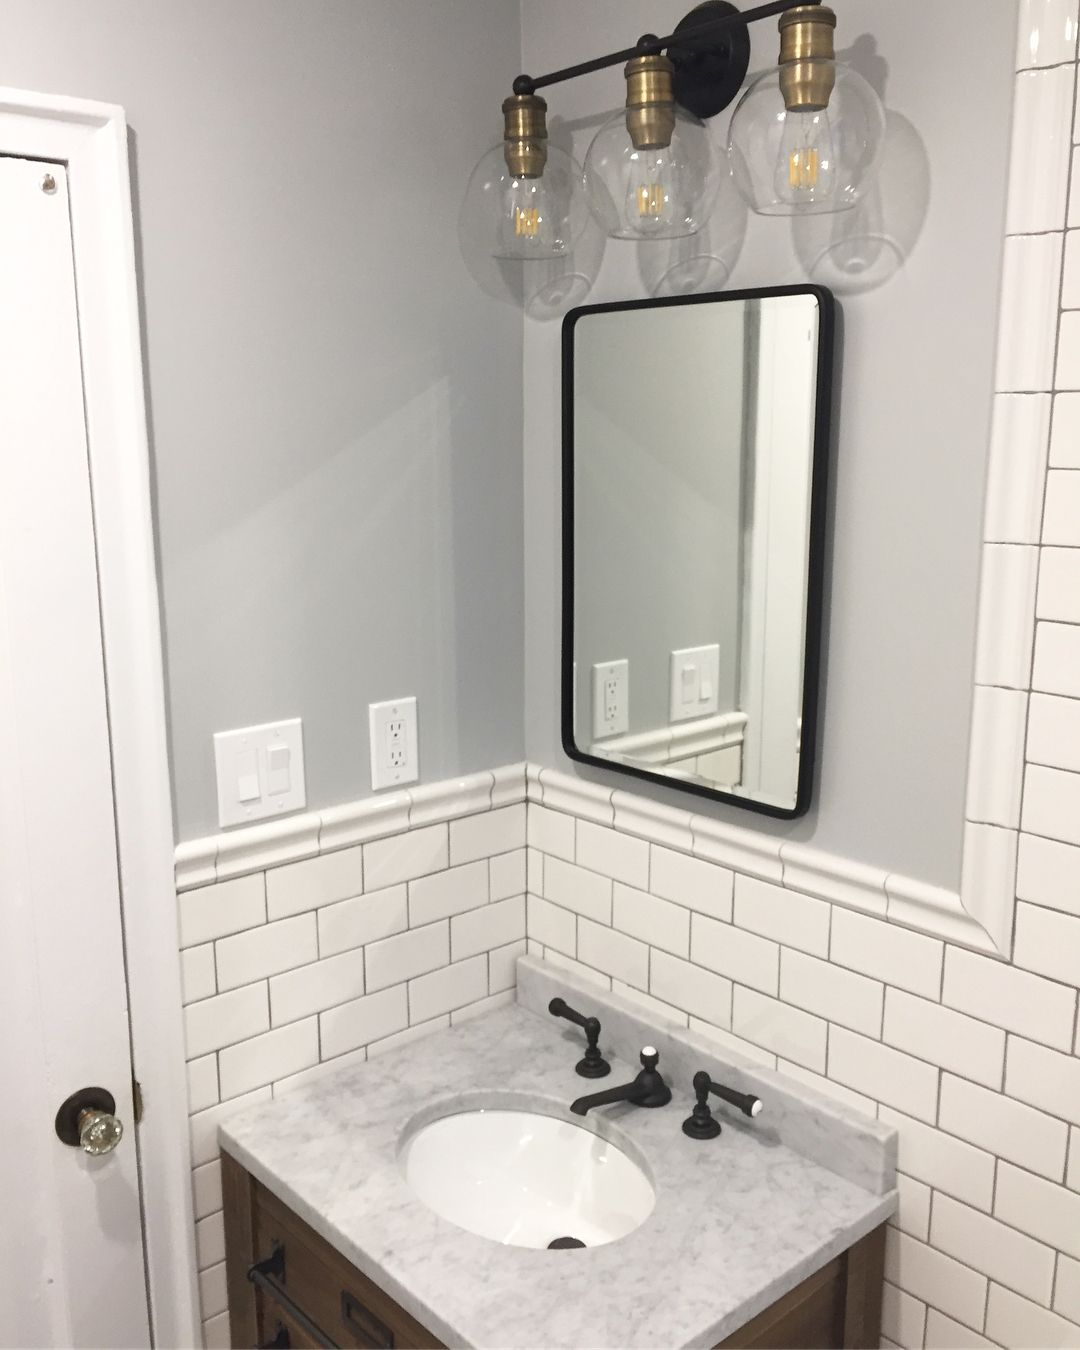 Farmhouse bathroom. White subway tile with gray grout